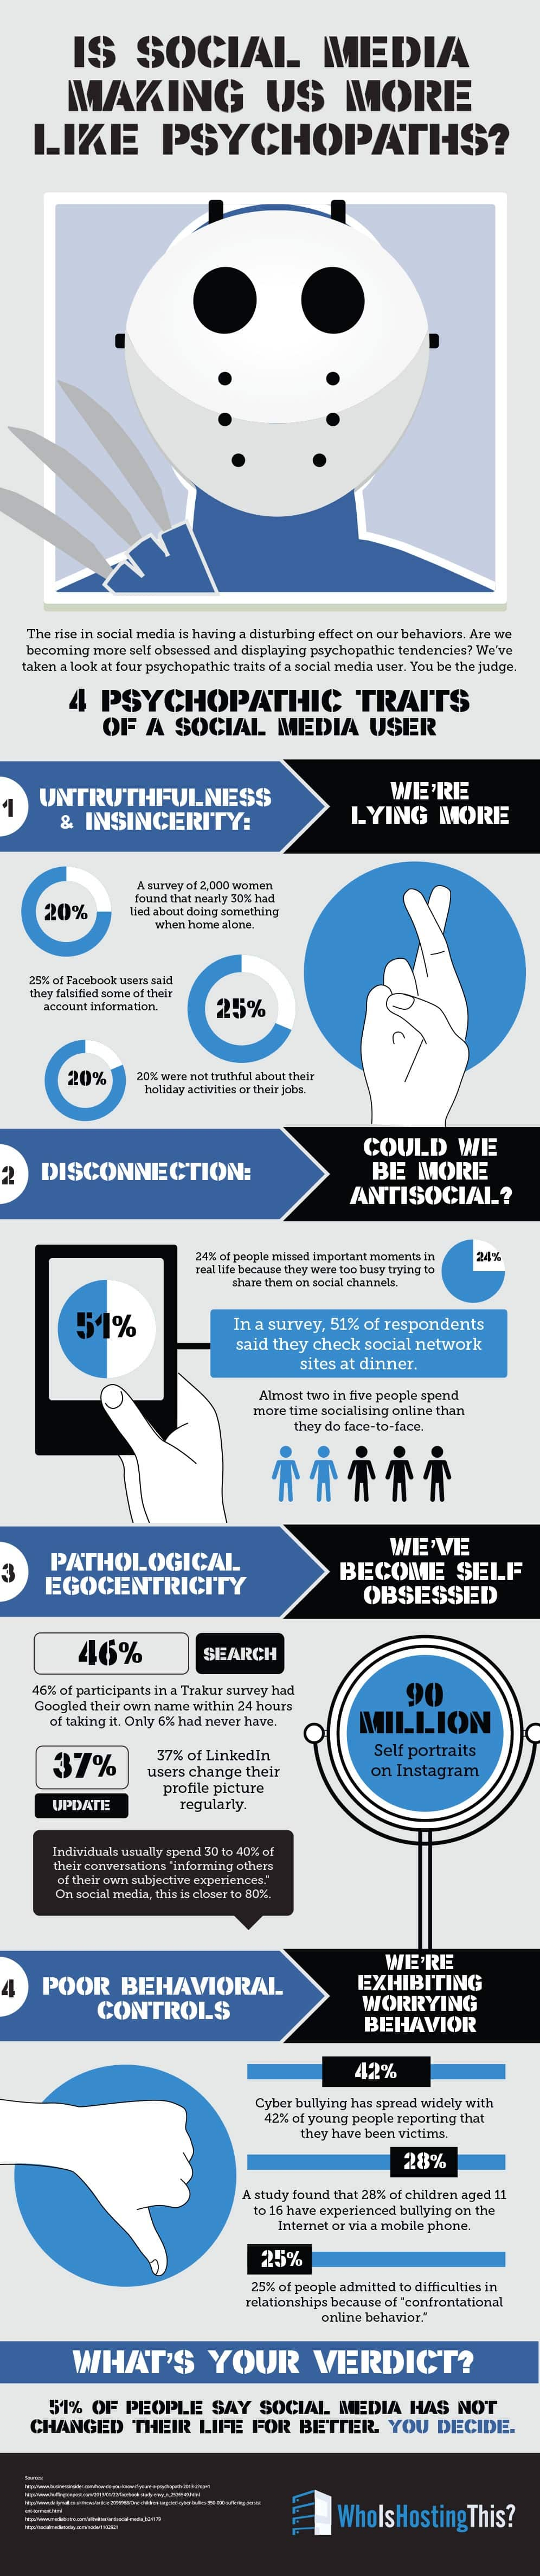 Social Media and Lying